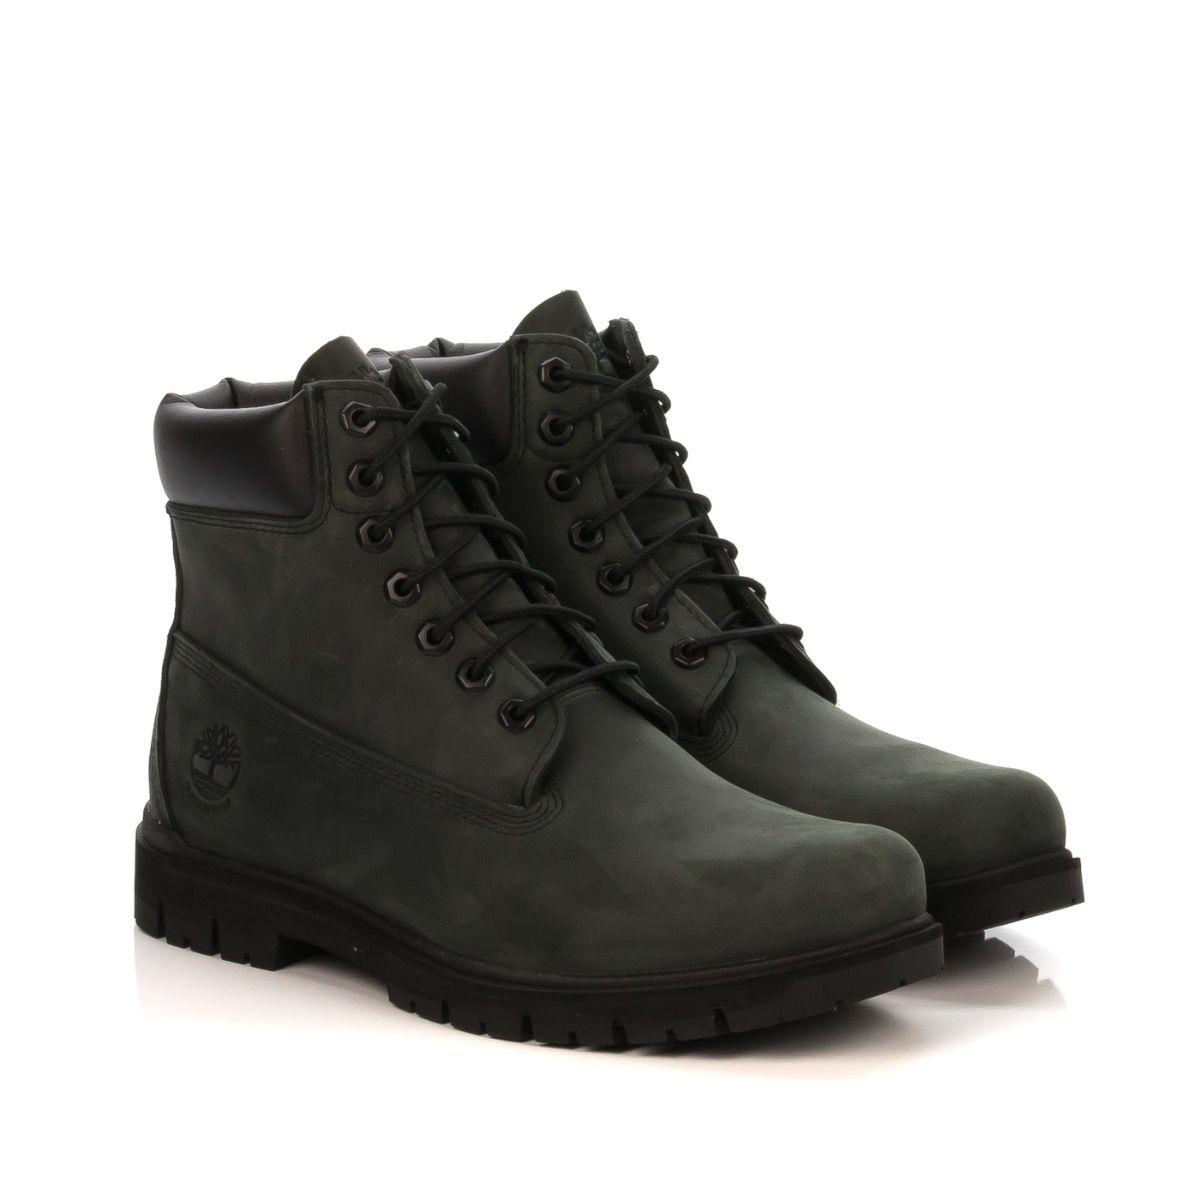 Center scarpa shoe Impermeabile A1uol Uomo anfibio Timberland mNnOvw80